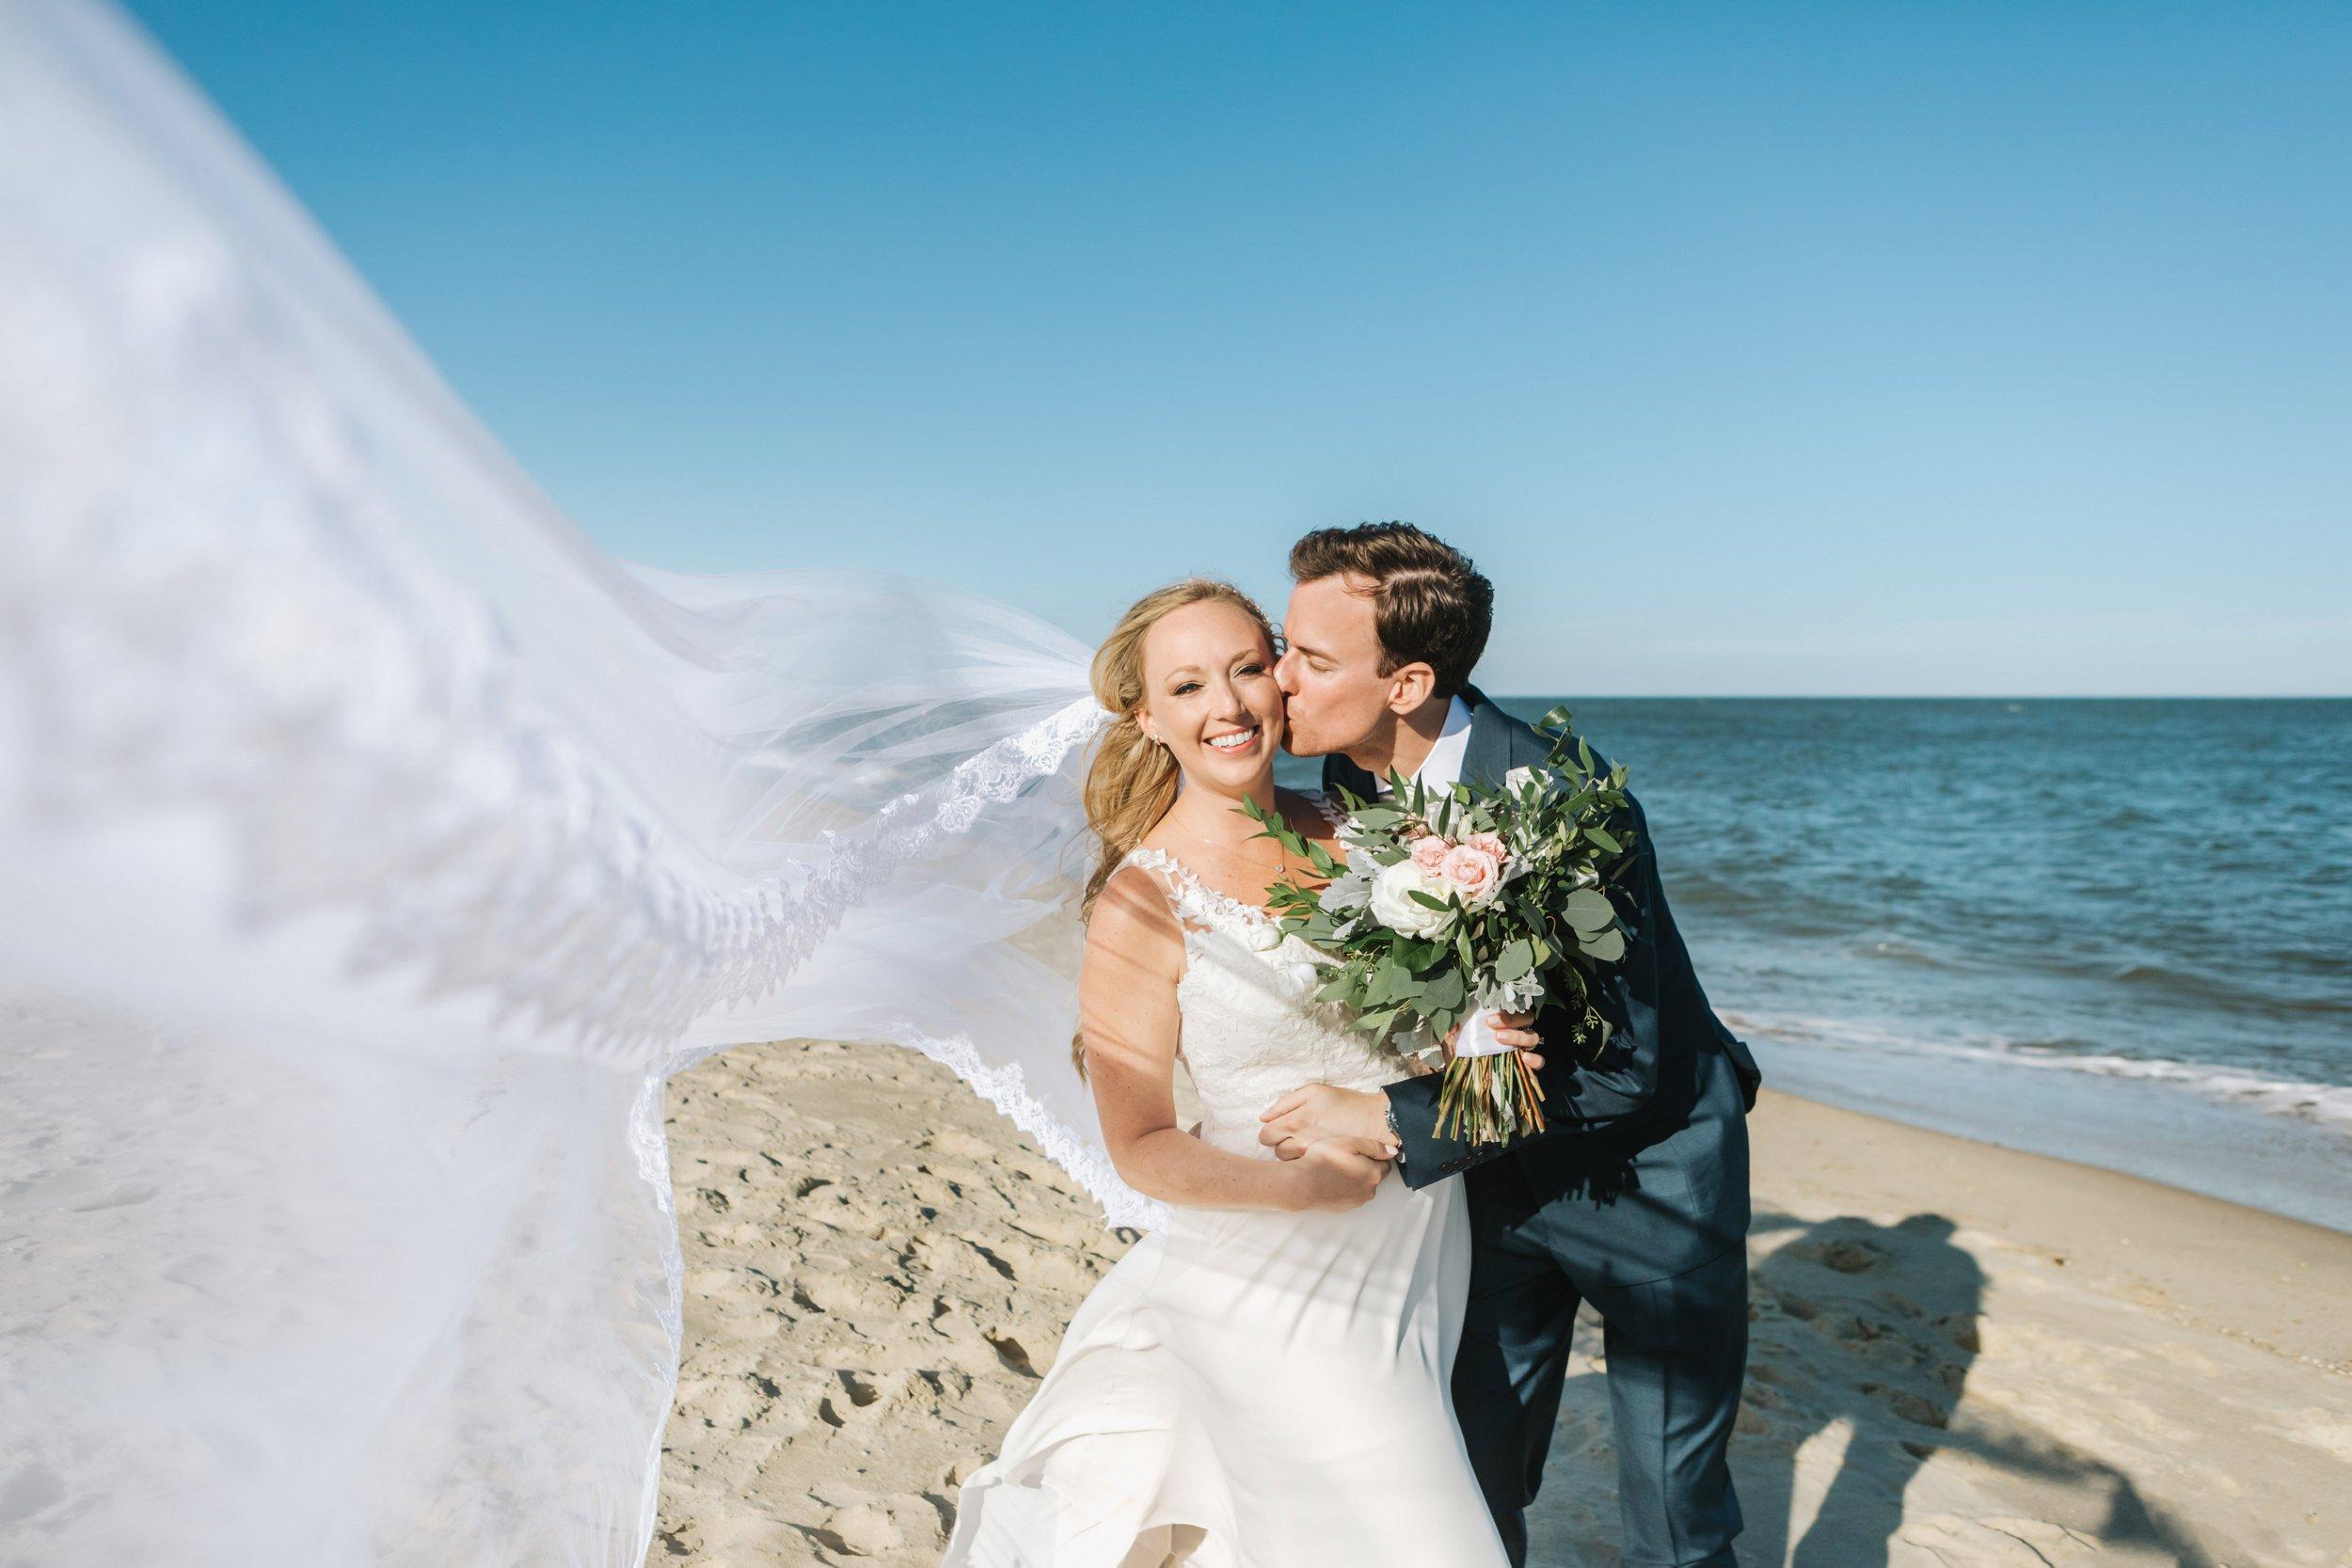 Popponesset-Inn-Wedding-Cape-Cod-Lena-Mirisola-Photography-27.jpg